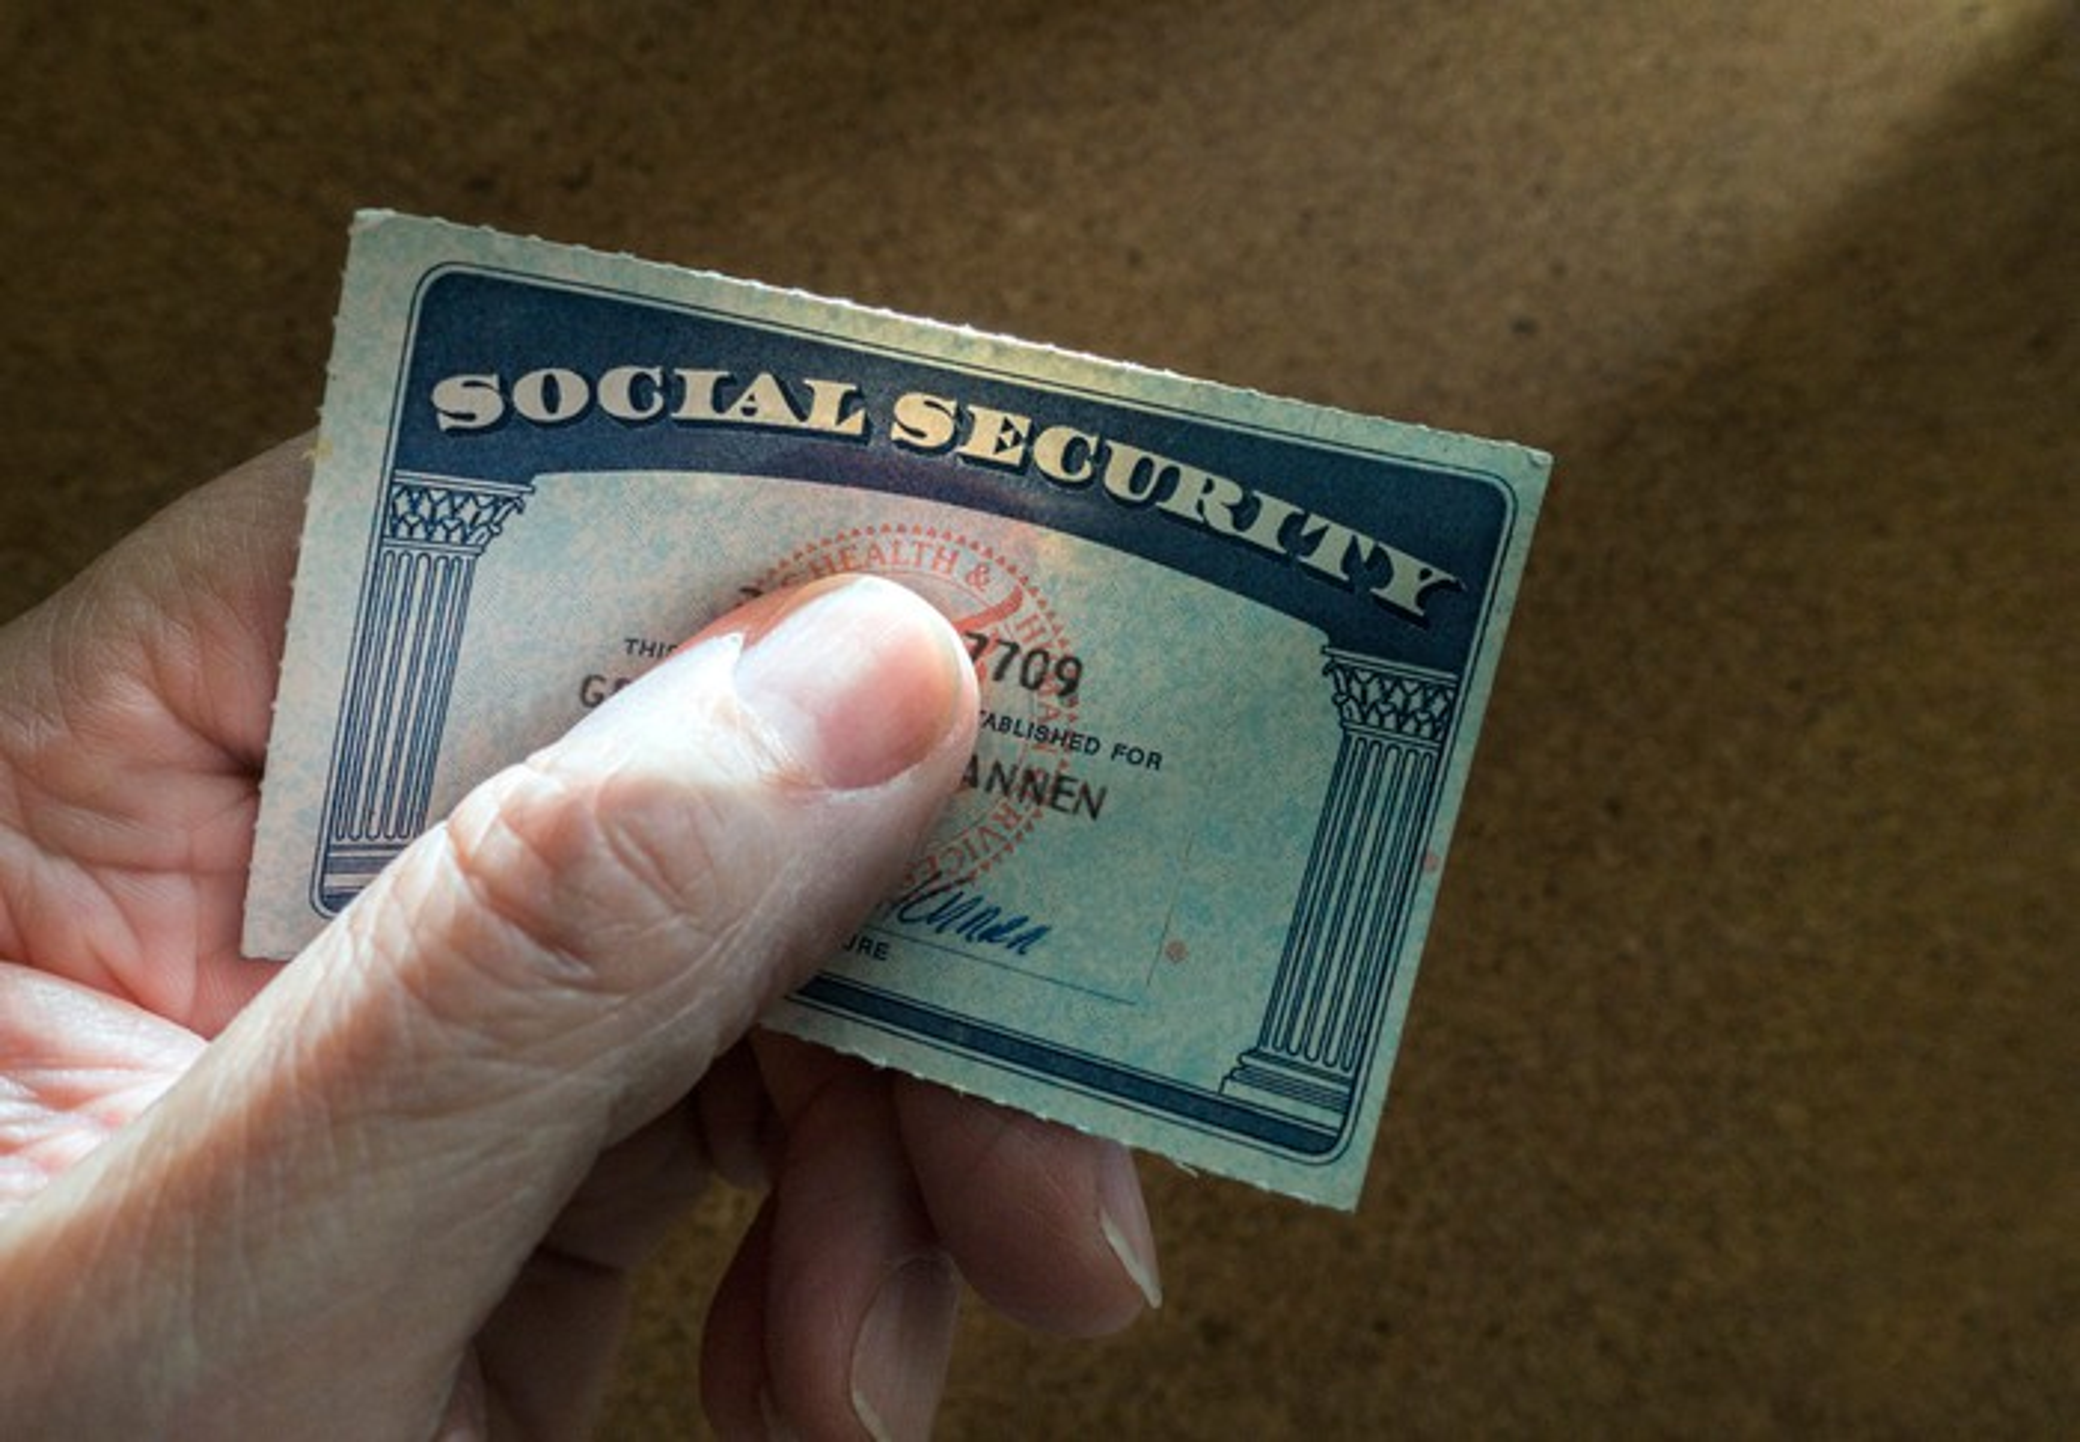 Man's finger on a Social Security card.